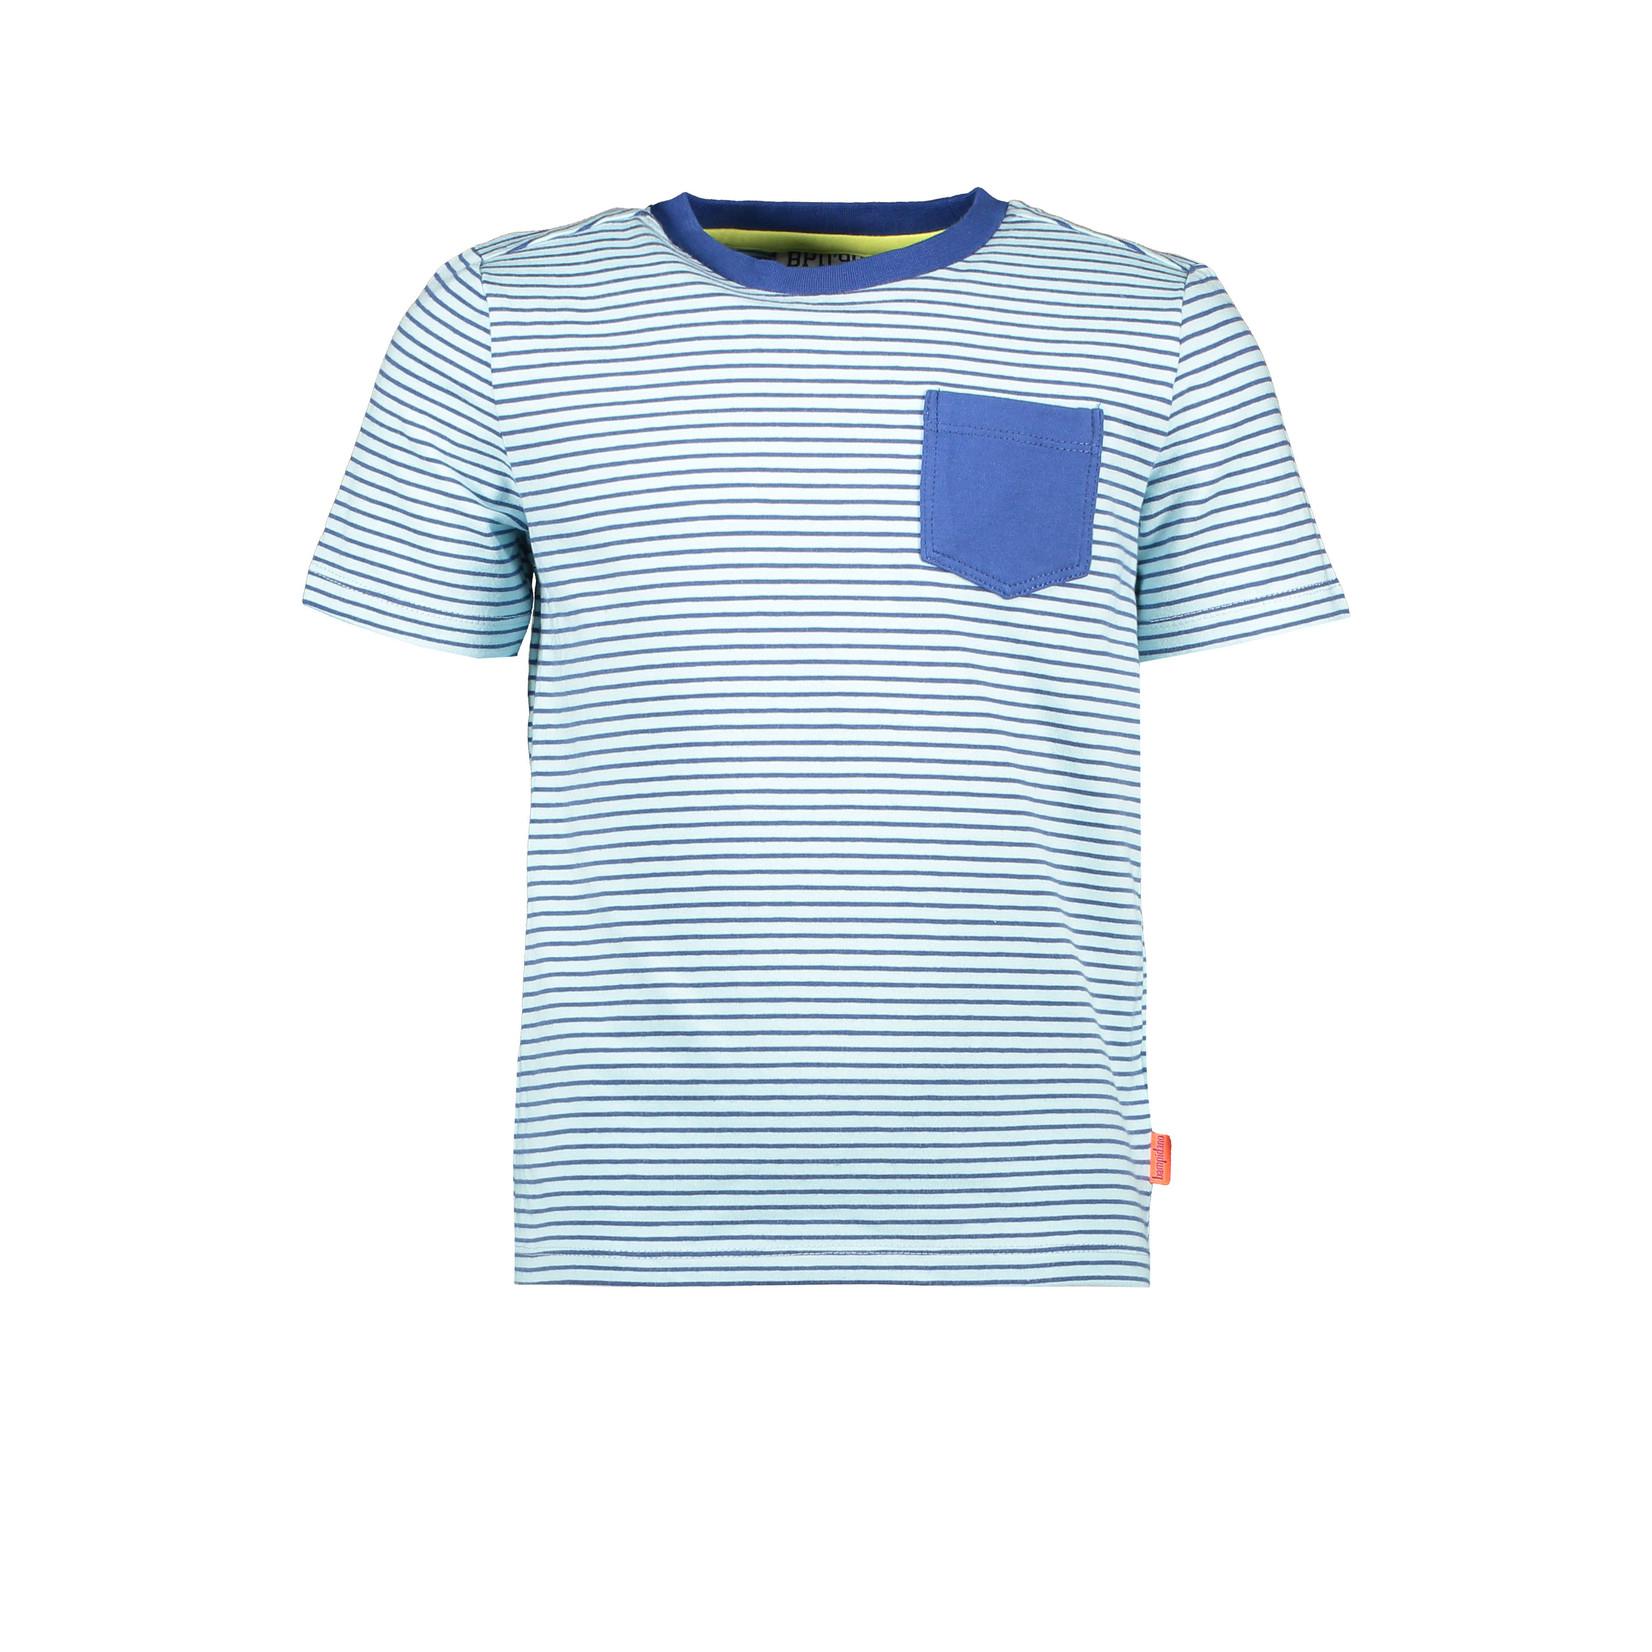 Bampidano Bampidano Junior Boys short sleeve T-shirt Ewan AO/yd stripe + chest pocket CACTUS